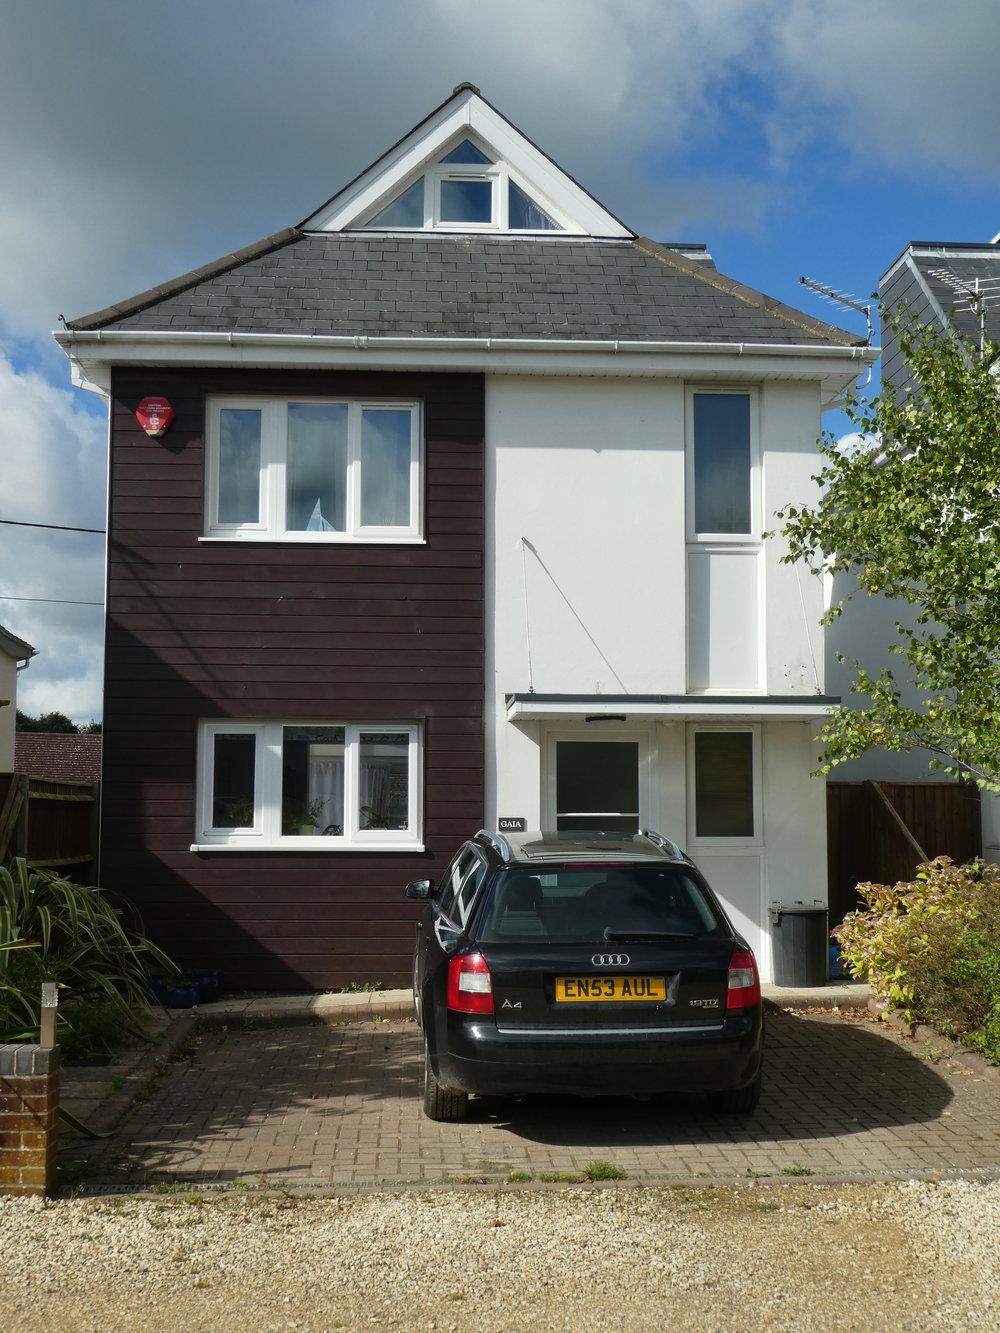 St Mark's Road, Lymington, new houses